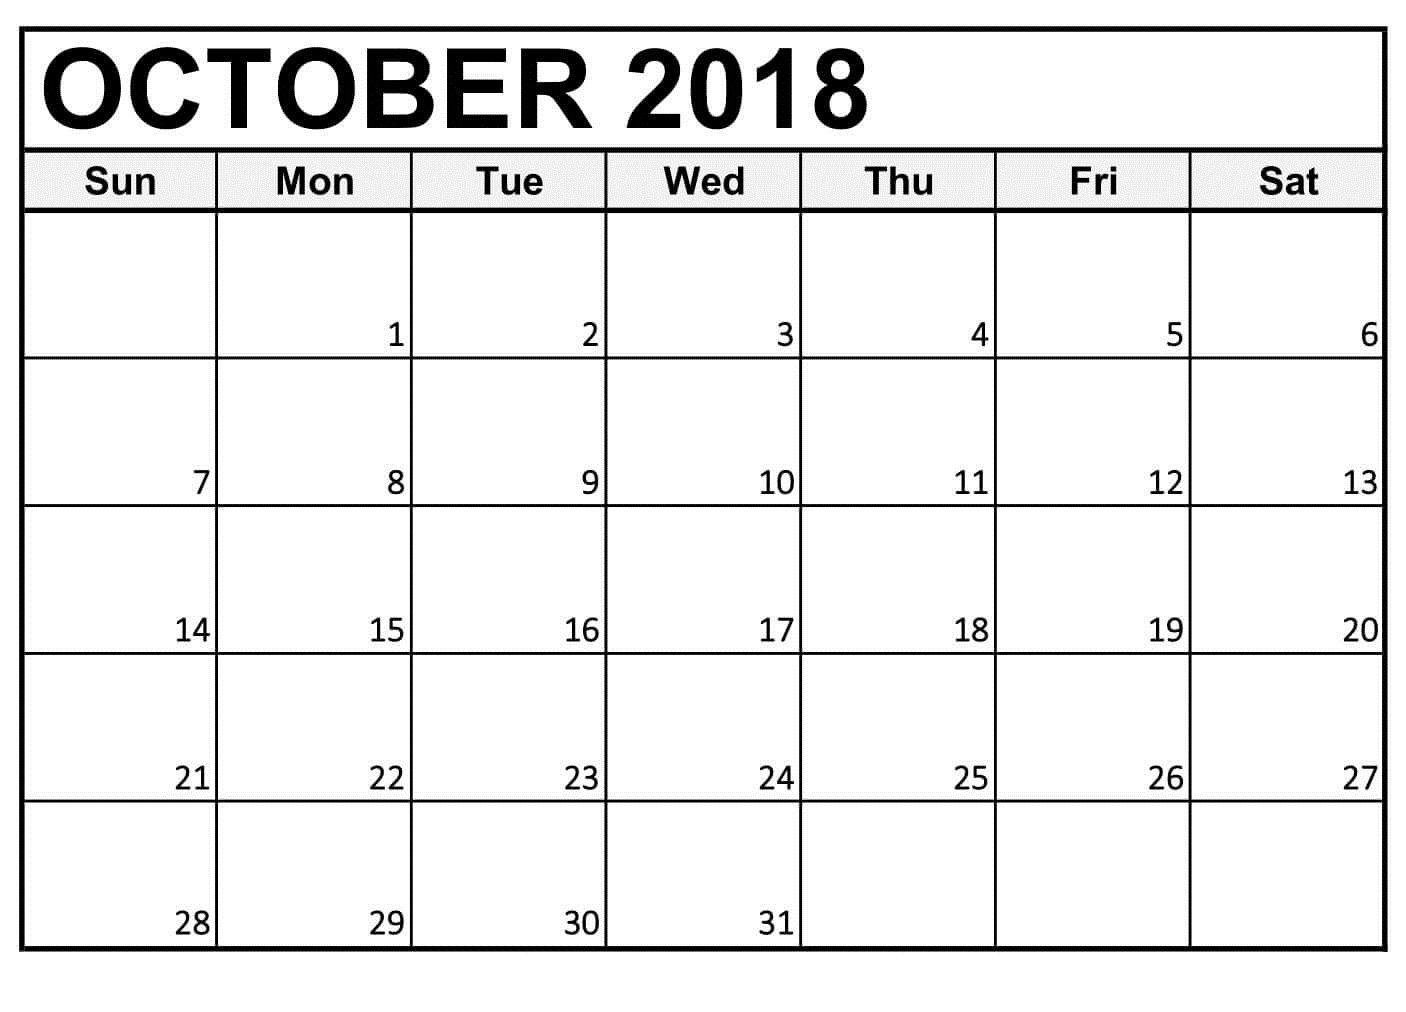 Free Bold Large Numbers Calendars | Ten Free Printable